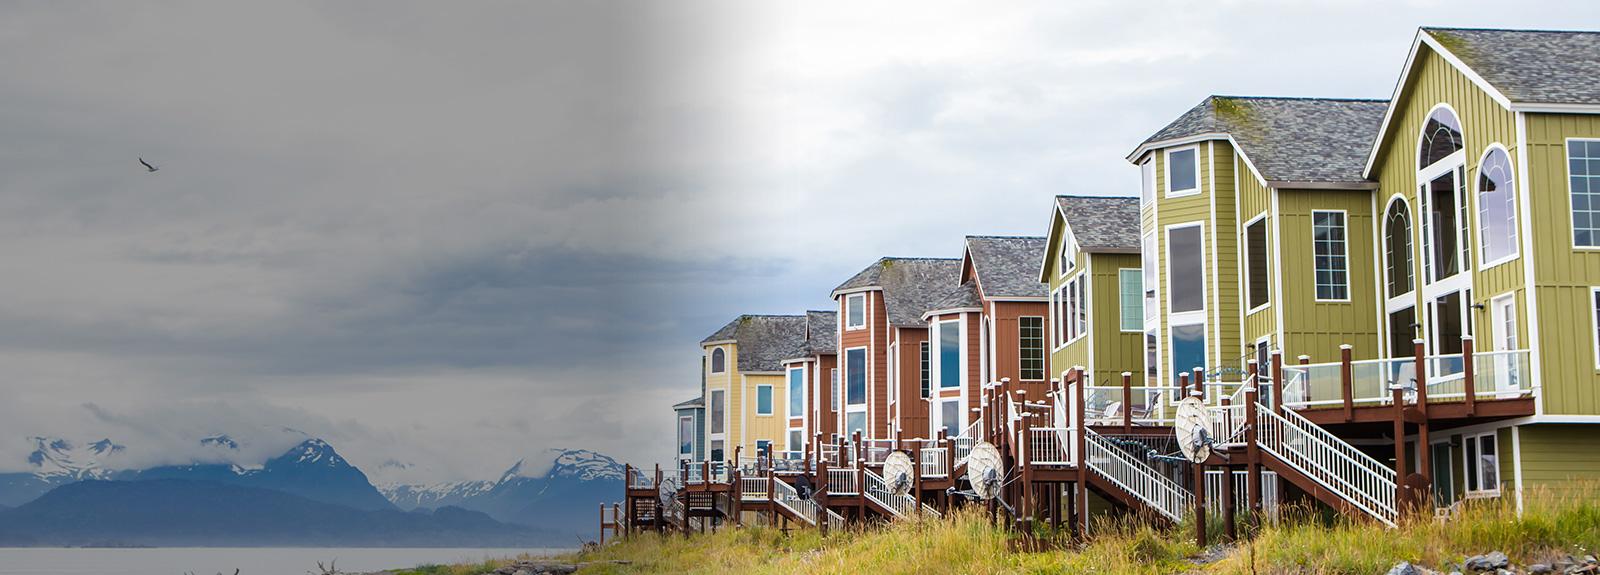 alaska home warranty companies and top reviews